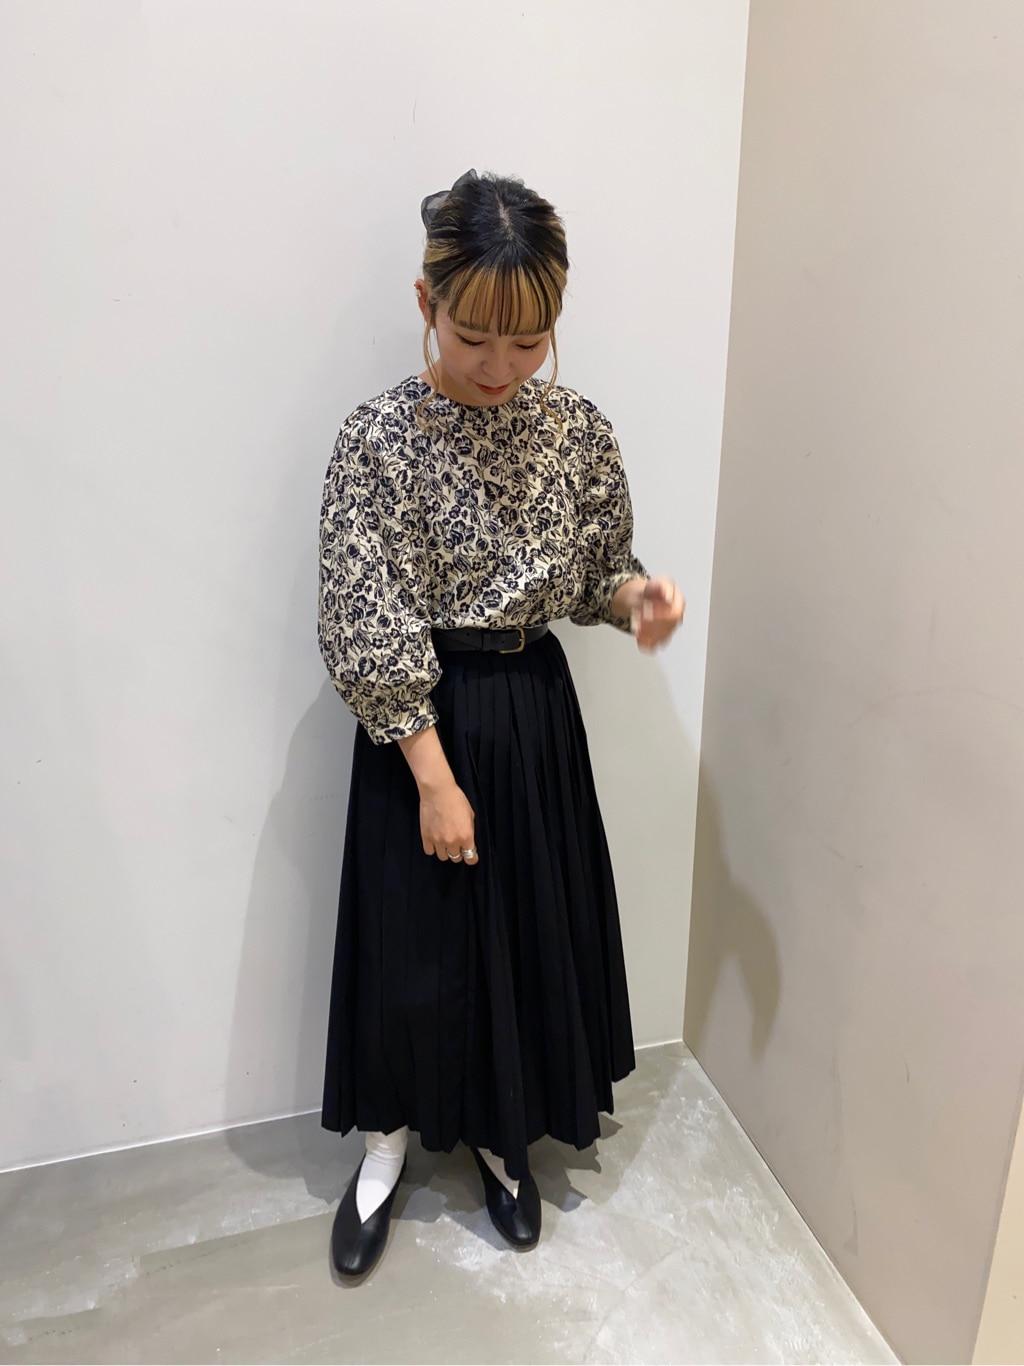 bulle de savon 阪急西宮ガーデンズ 身長:150cm 2020.09.01